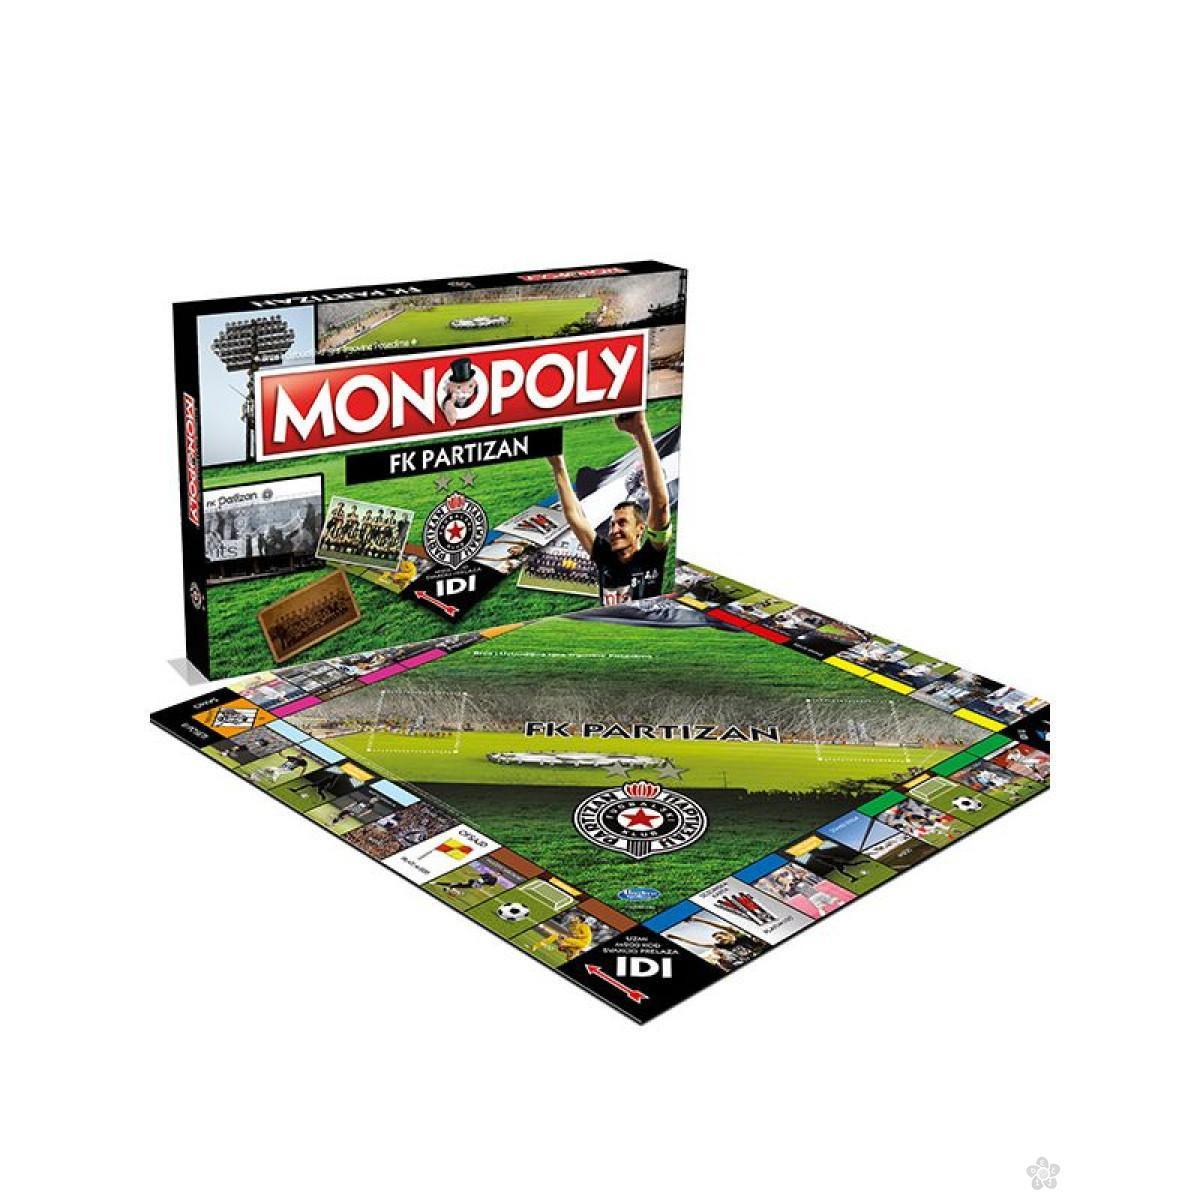 Društvena igra Monopol FK Partizan, 001991